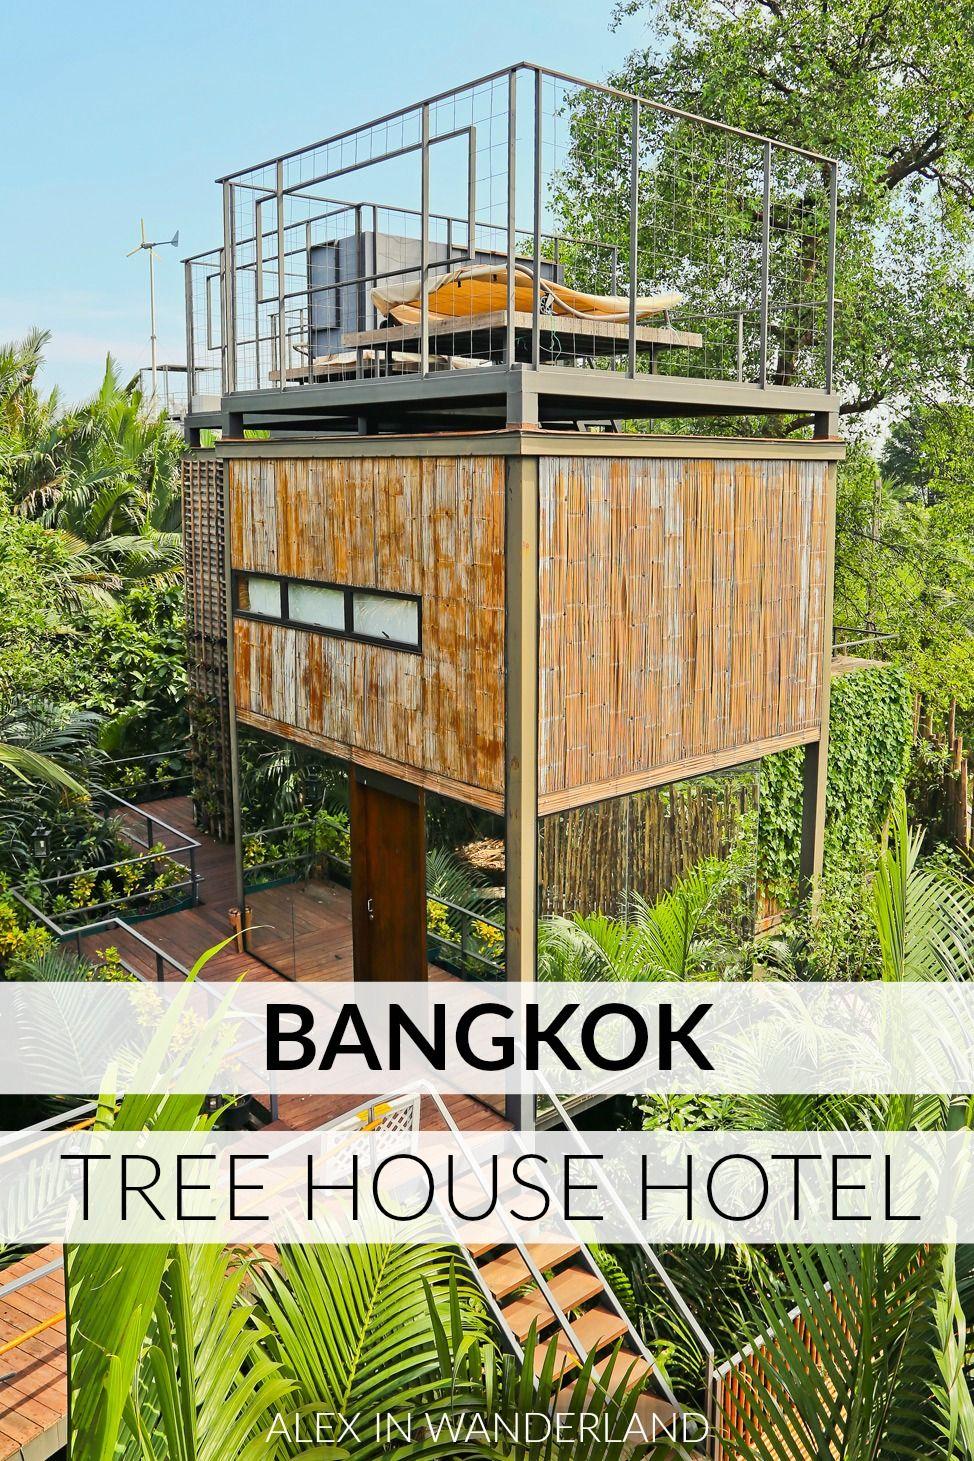 The 25 Best Bangkok Hotel Ideas On Pinterest Bangkok